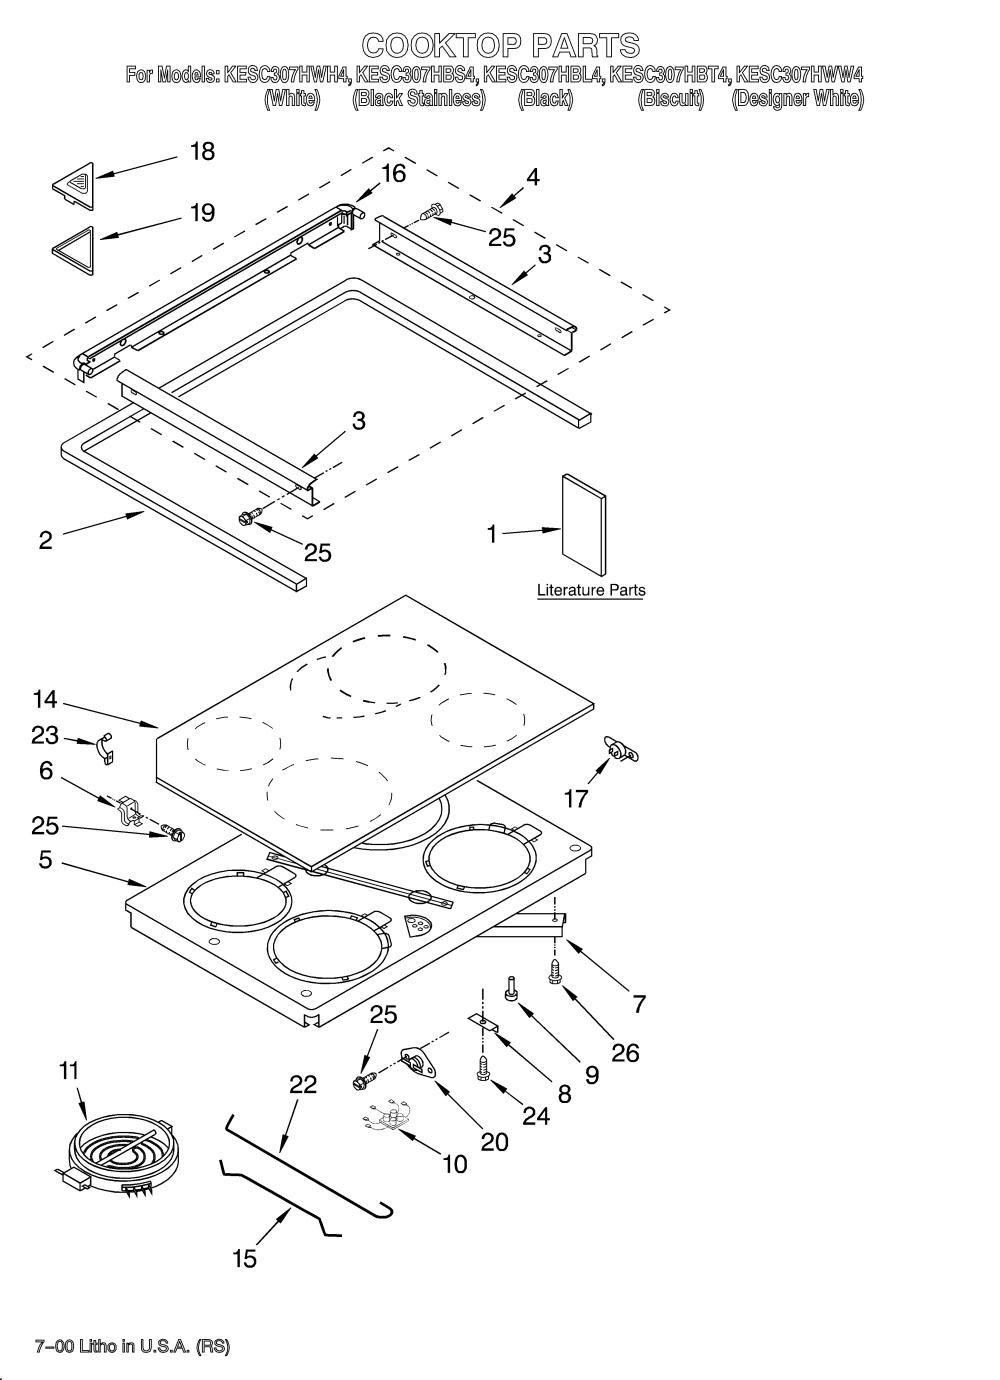 medium resolution of kesc307hbt4 electric slide in range cooktop literature parts diagram